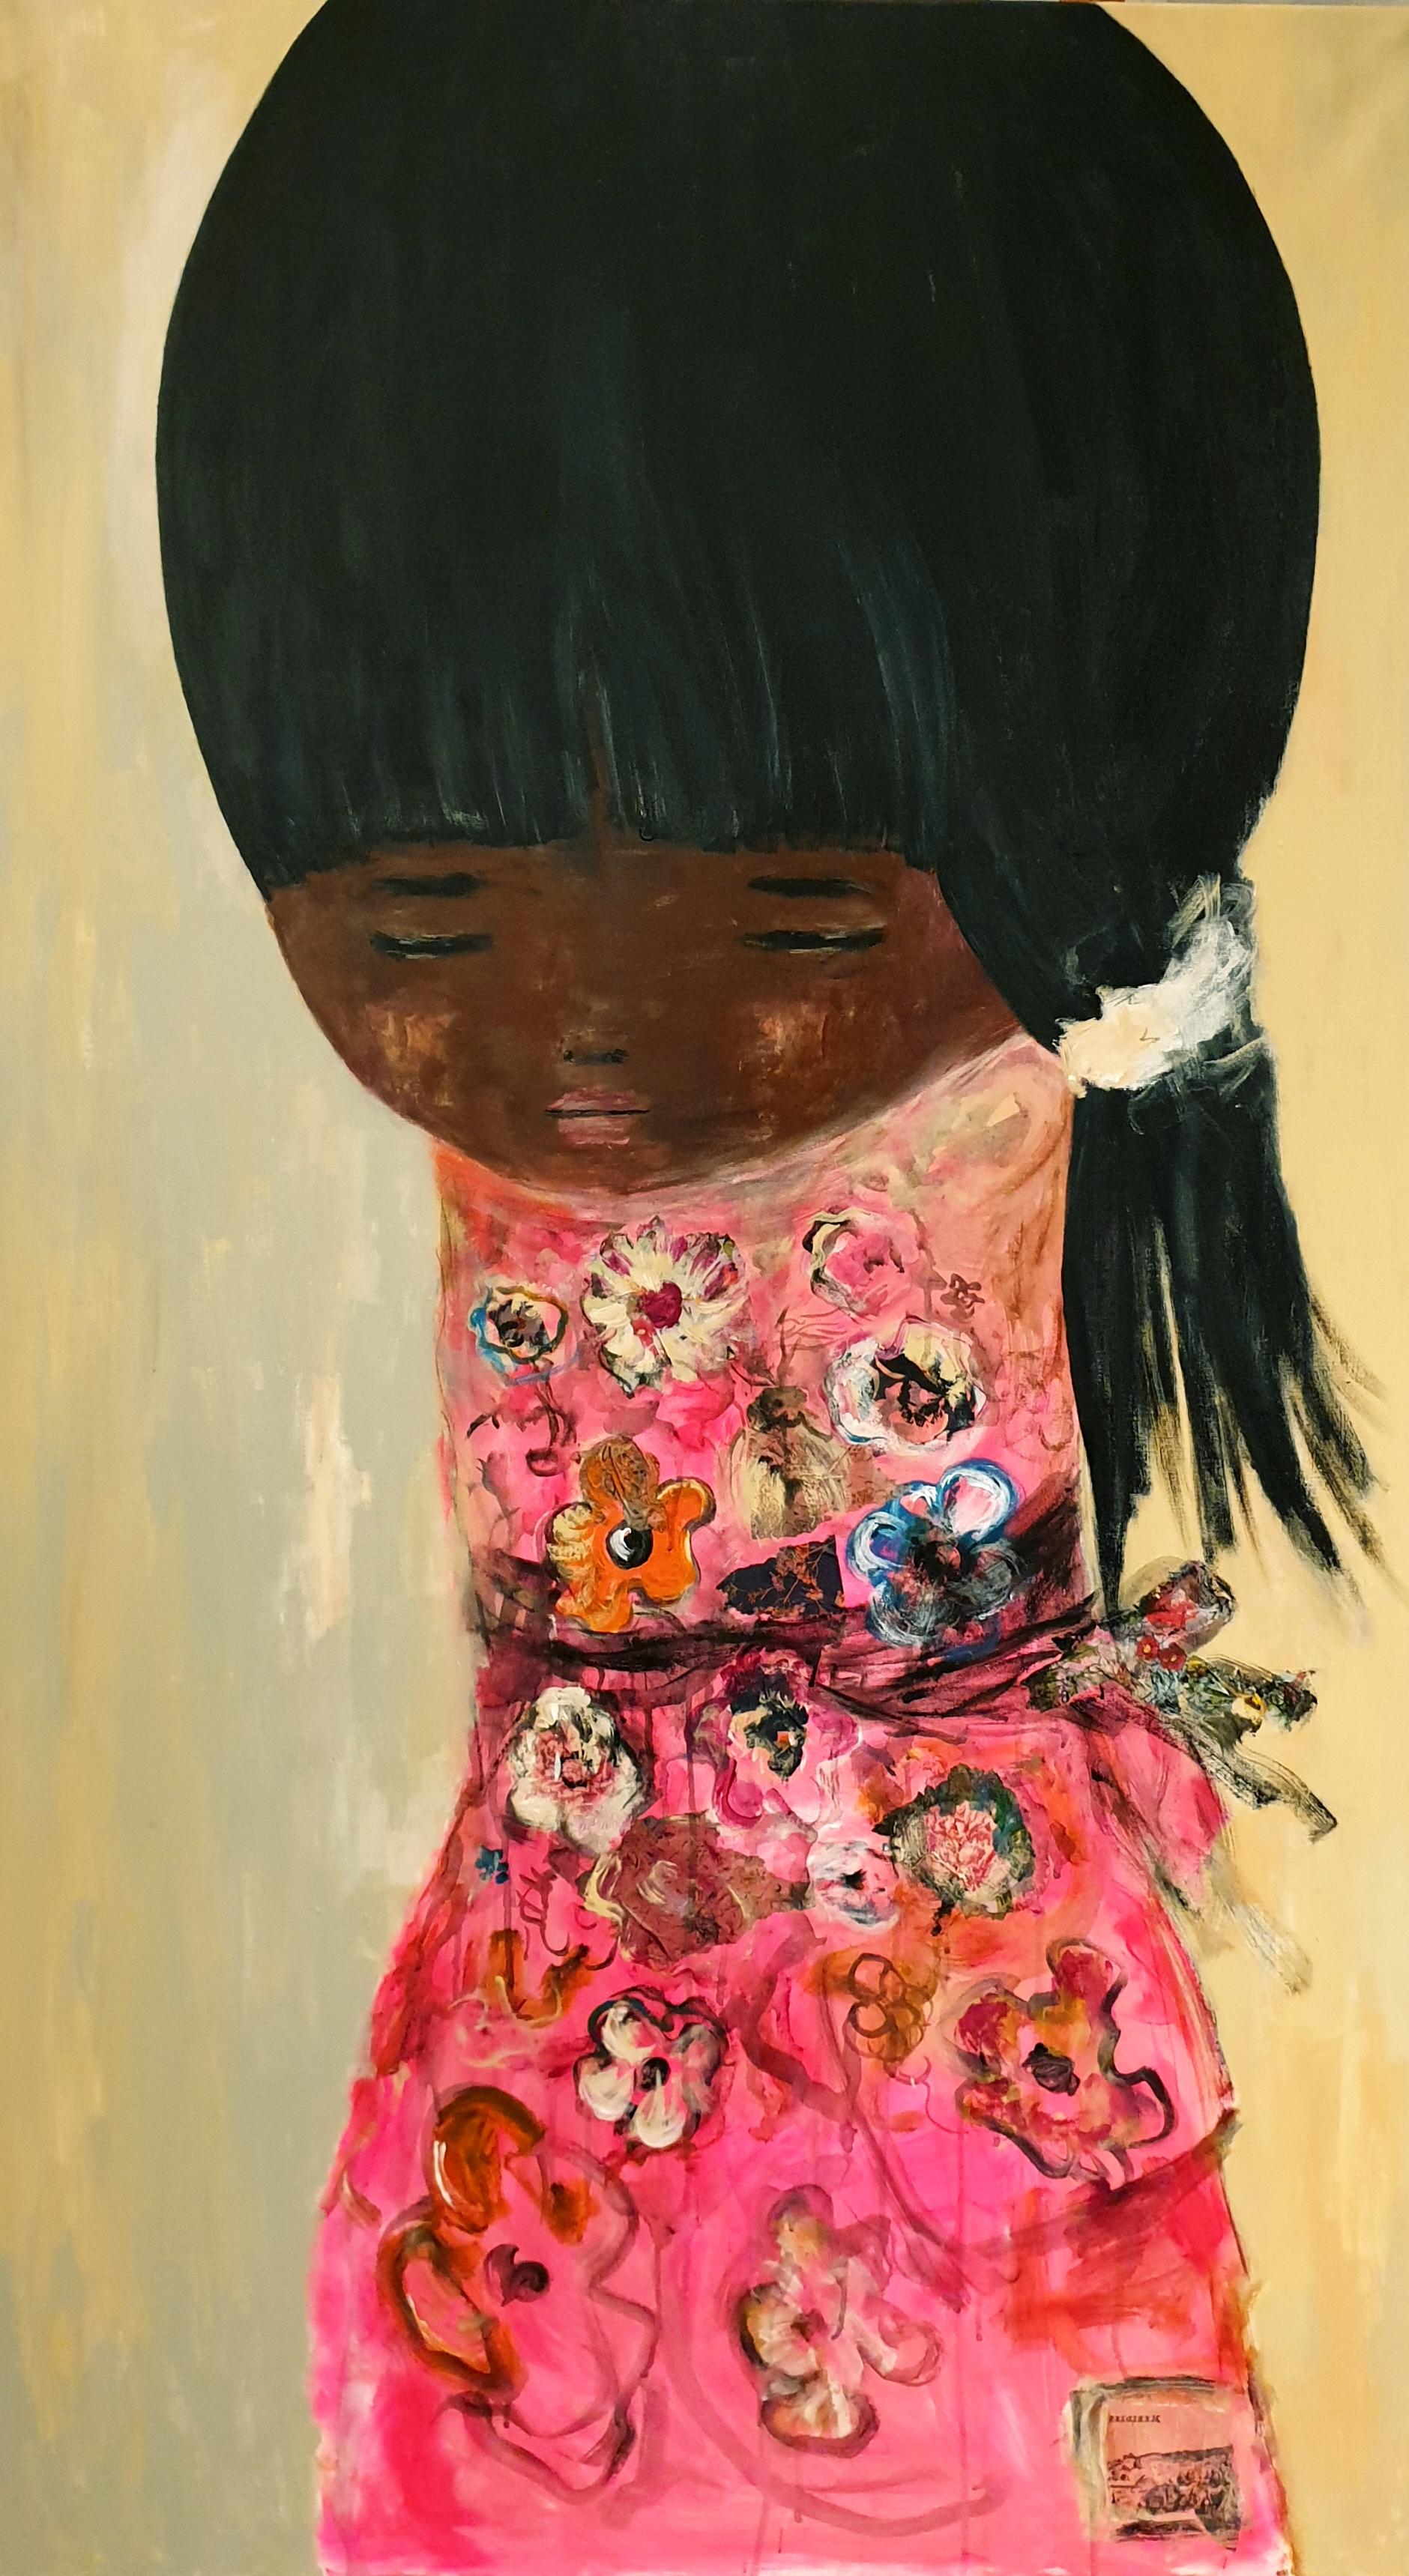 """Yoko"" das sonnenkind acryl auf Leinwand 160 cm x 90 cm"